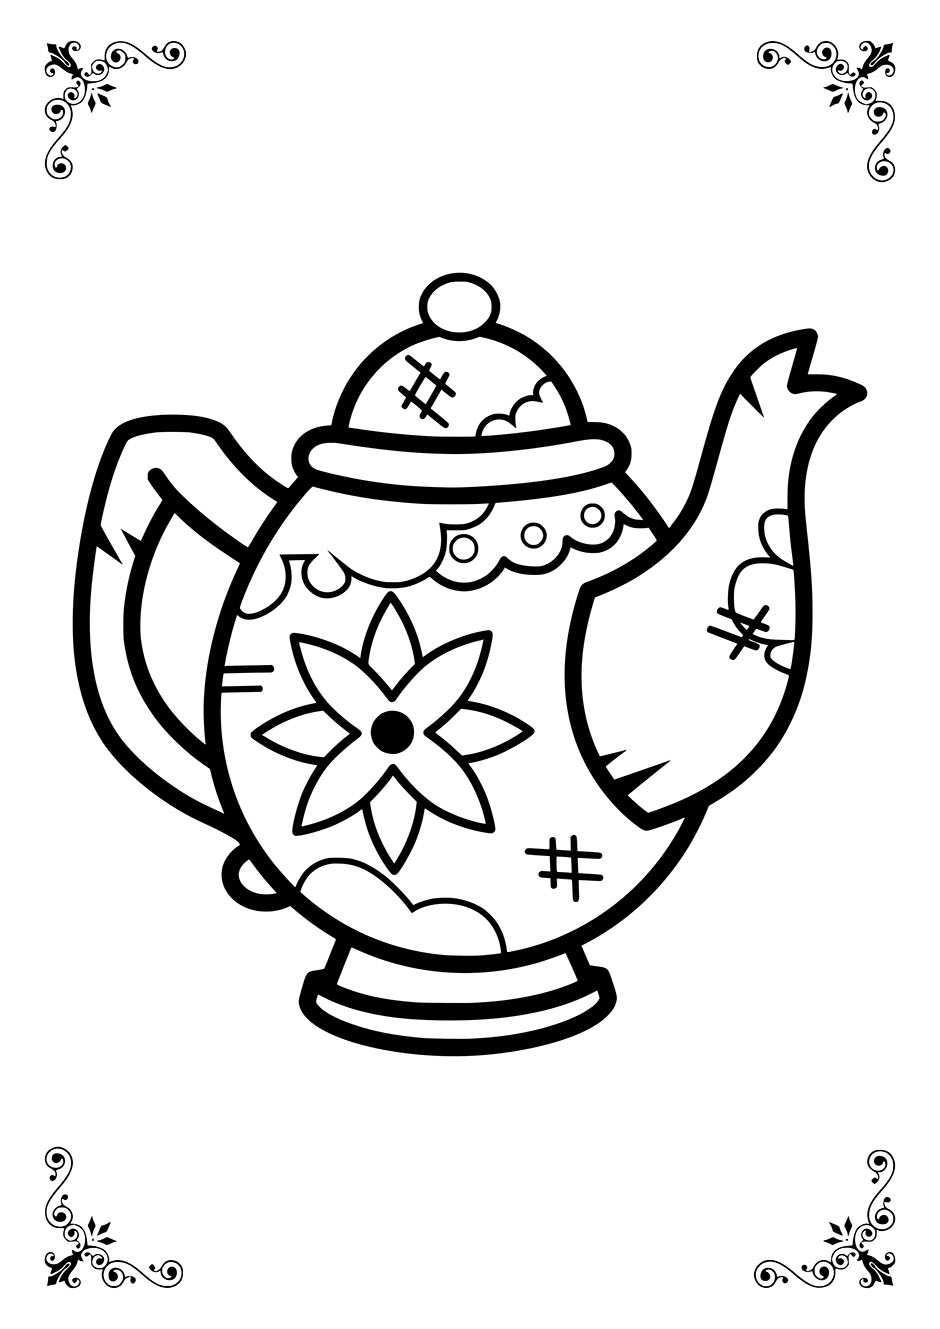 Раскраска: чайник с цветком — raskraski-a4.ru